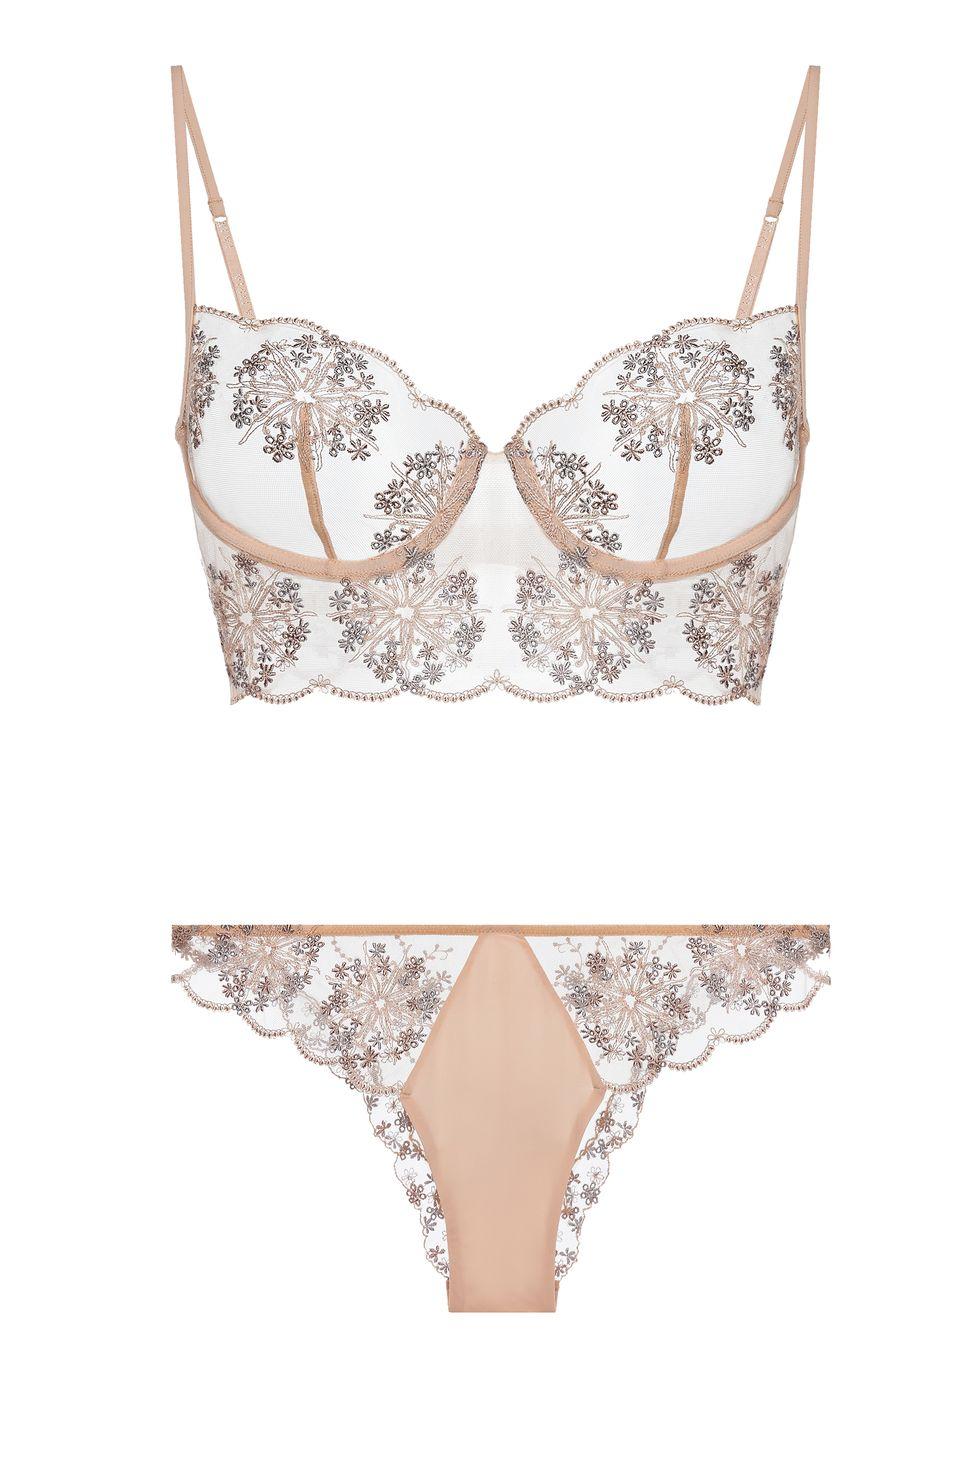 La Perla, Flower Explosion embroidered stretch-tulle Blush set, сутиен за 370лв, танга за 245лв